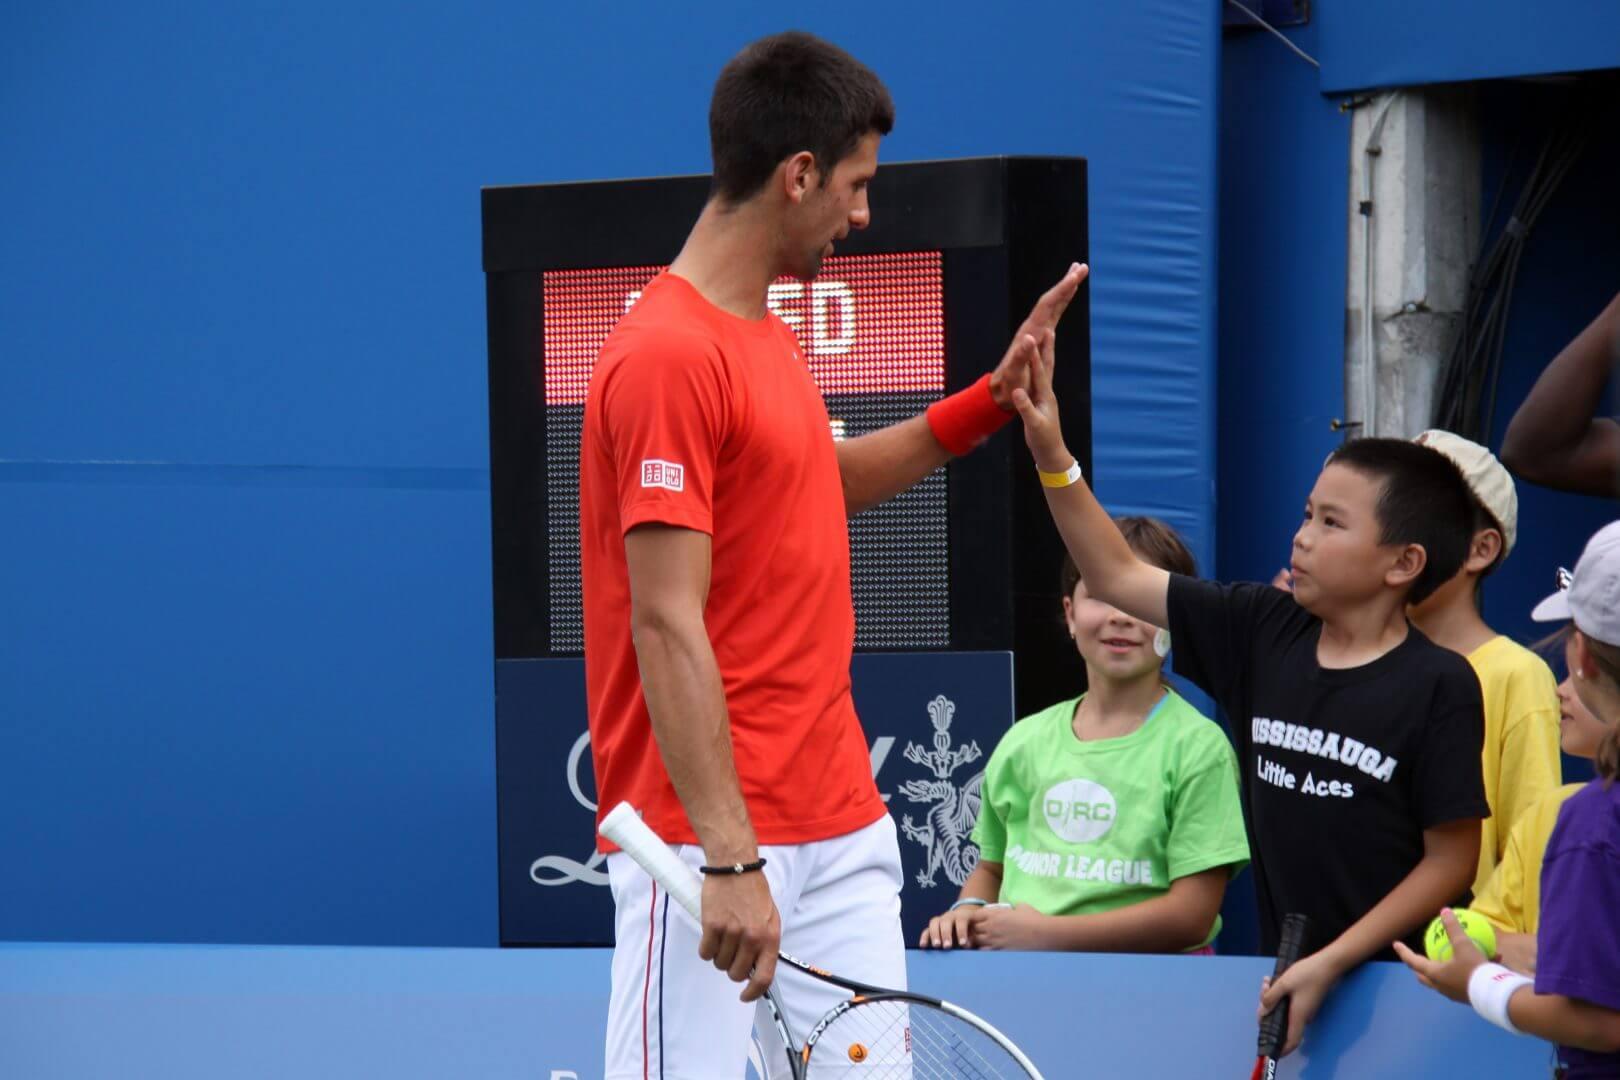 Novak Djokovic Giving a High Five - Cómo crear a un buen líder - Las 5 características que deben tener